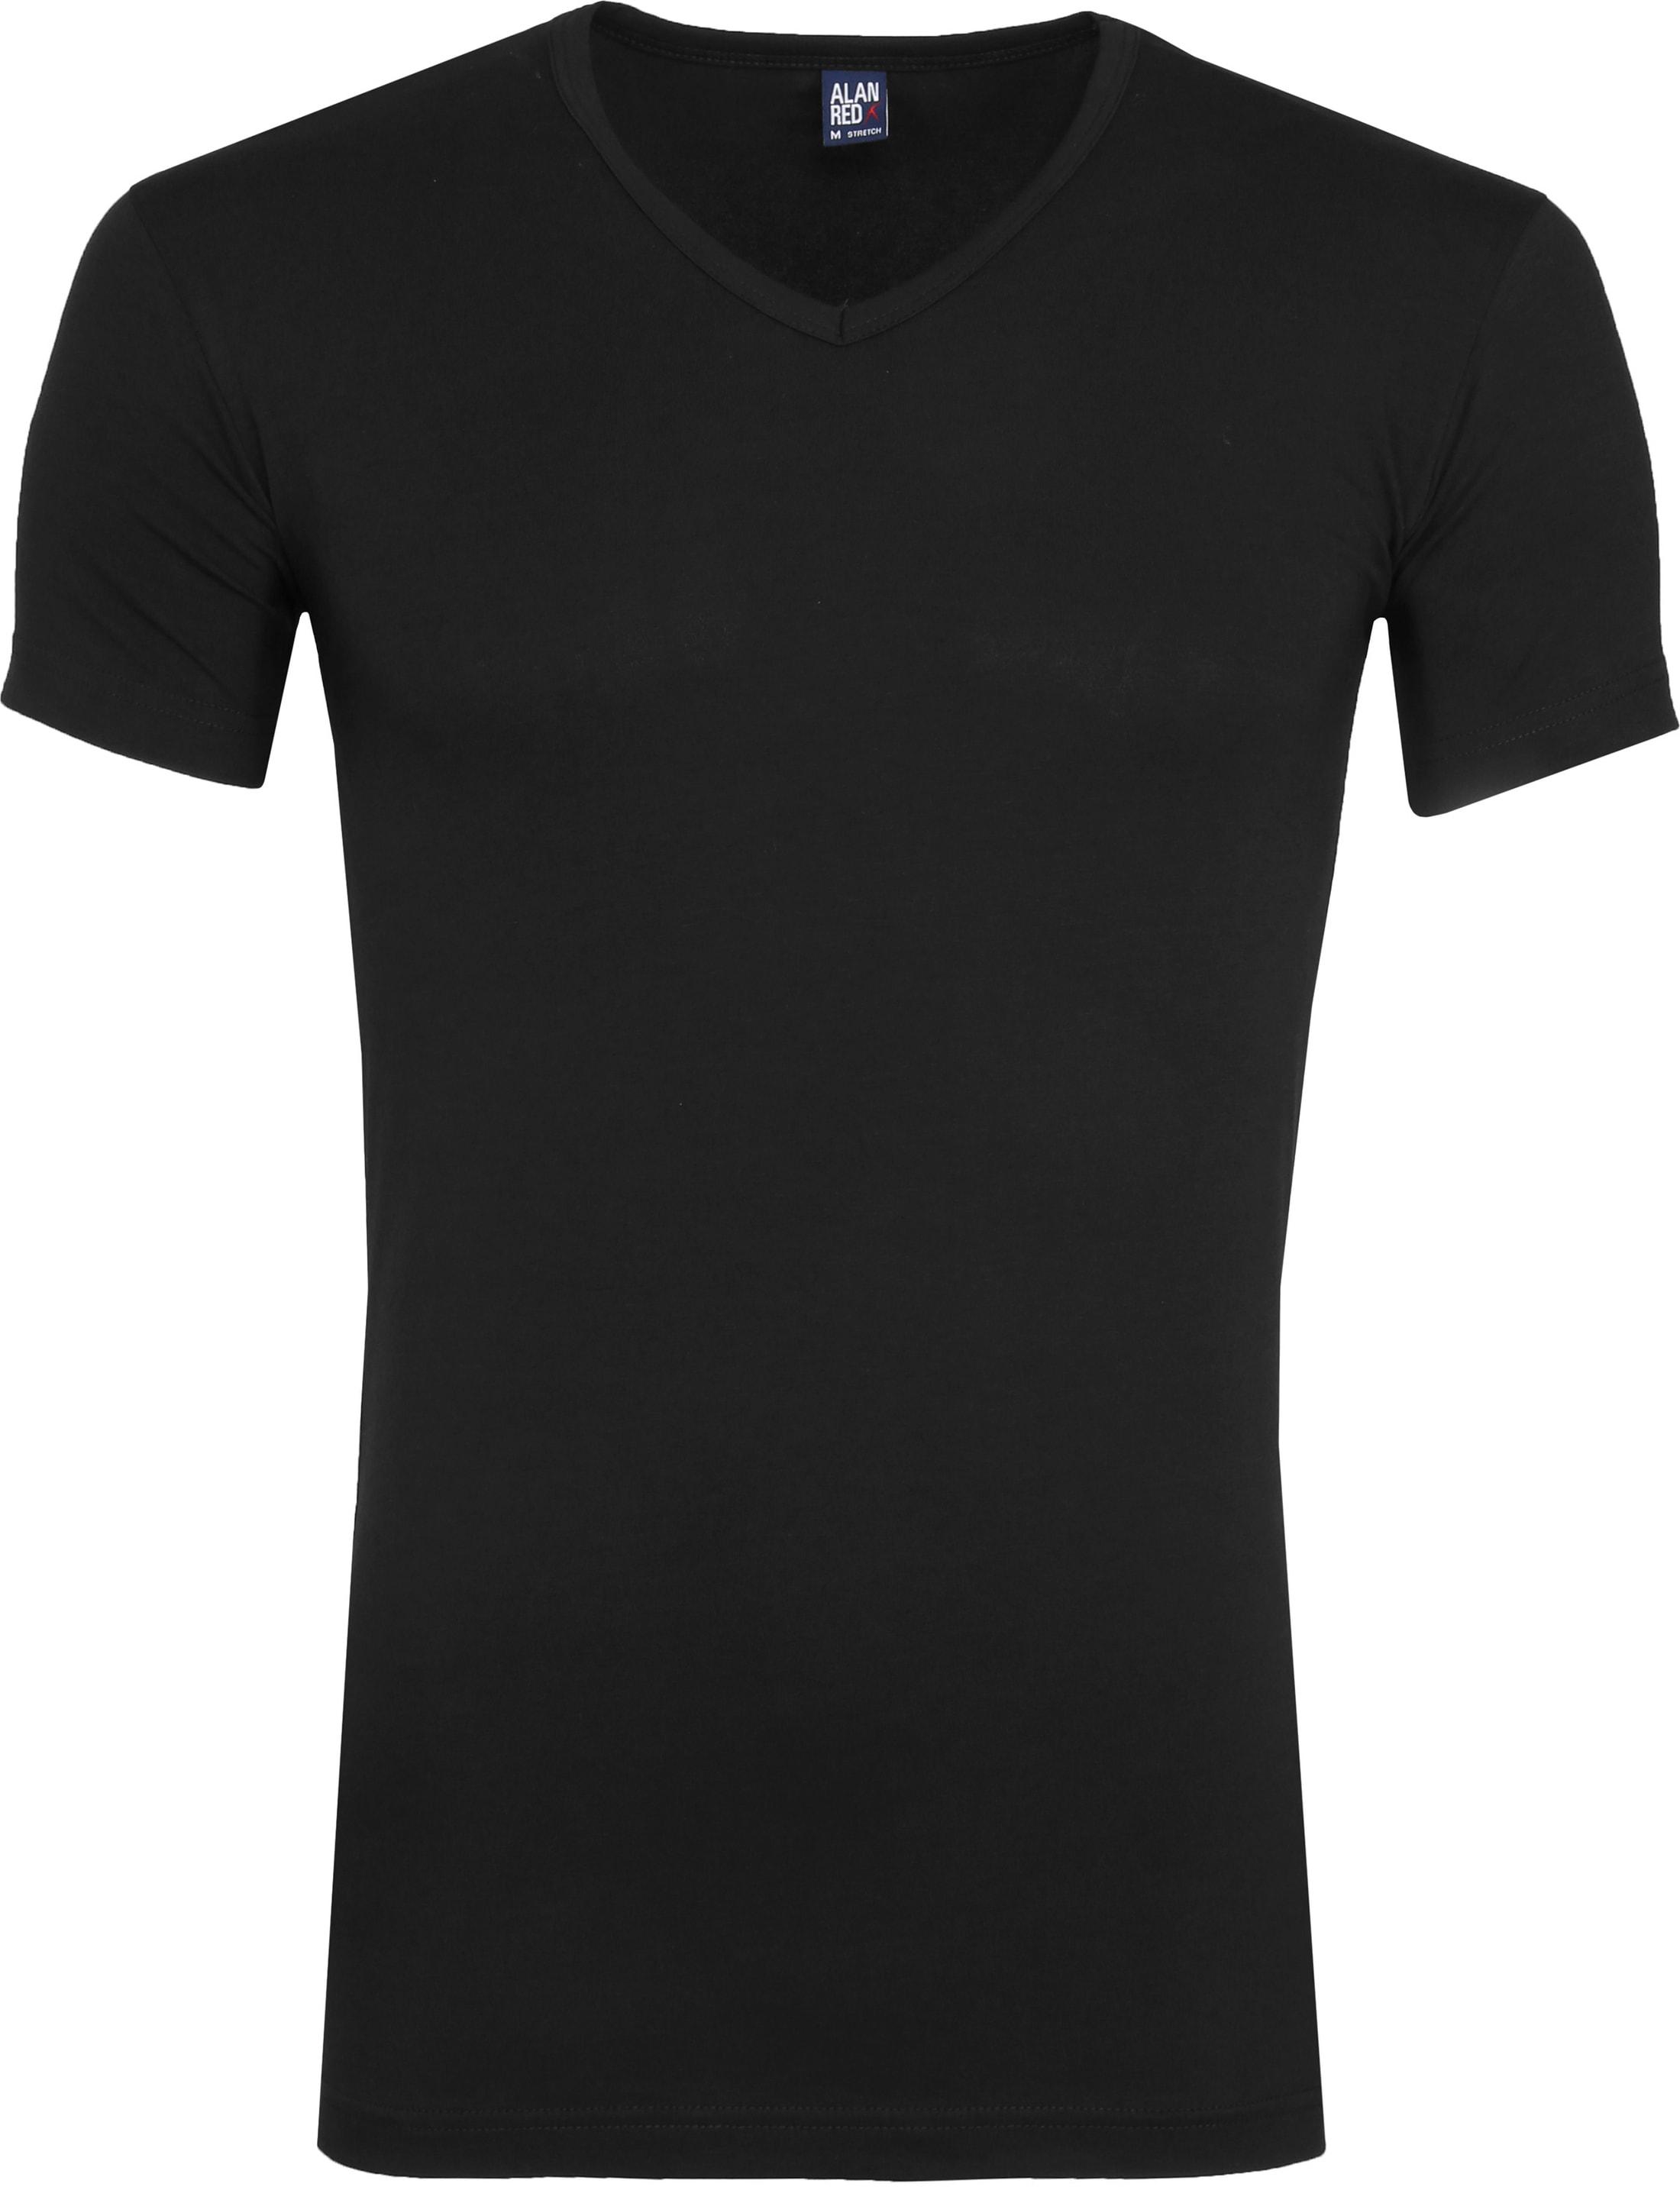 Alan Red Oklahoma T-Shirt Stretch Zwart (2-Pack) foto 1